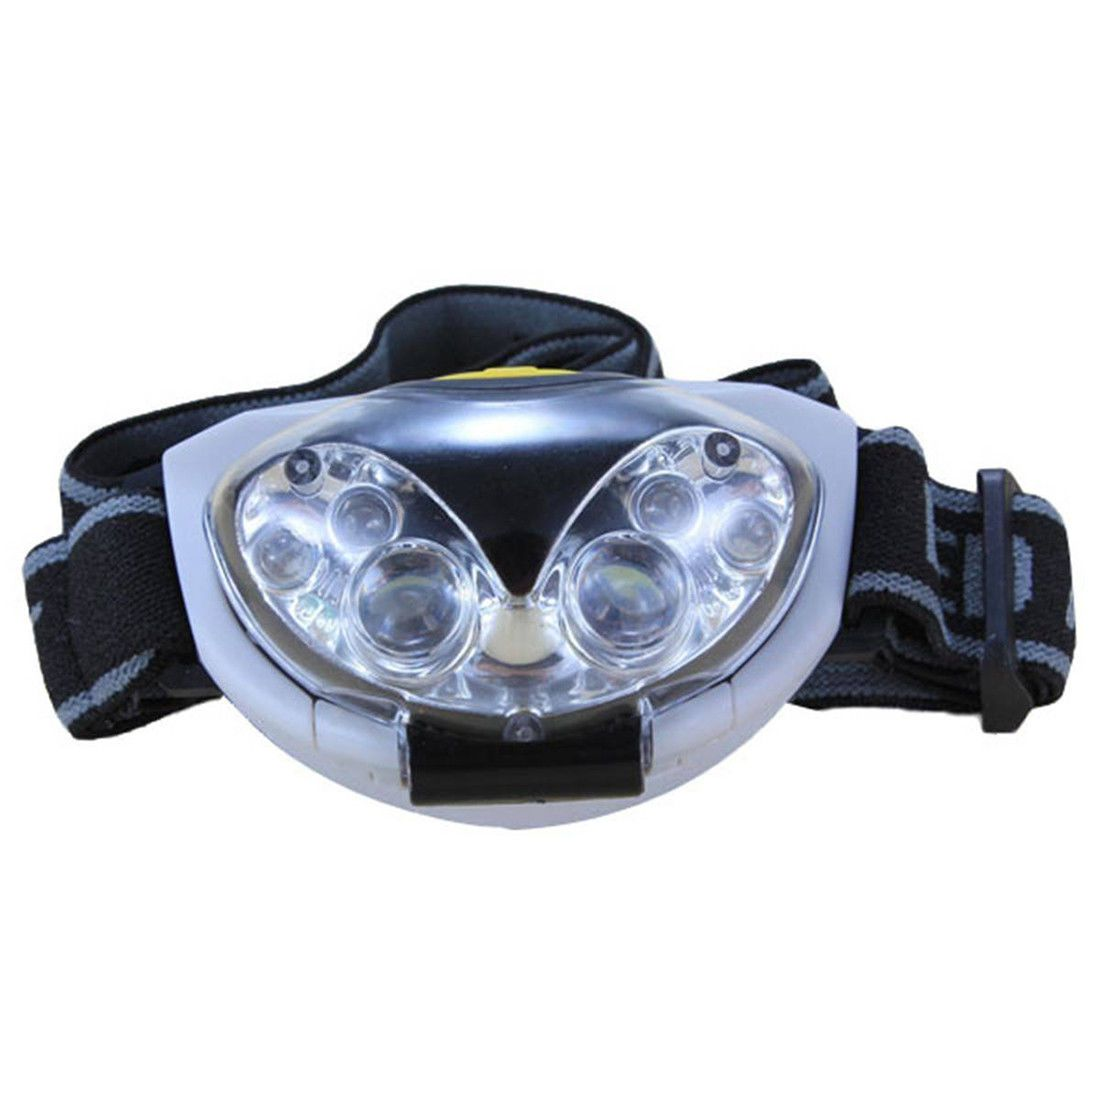 3 X AAA batteries S9R7 6 LED Waterproof Headlight Headlamp Head lamp 3 modi